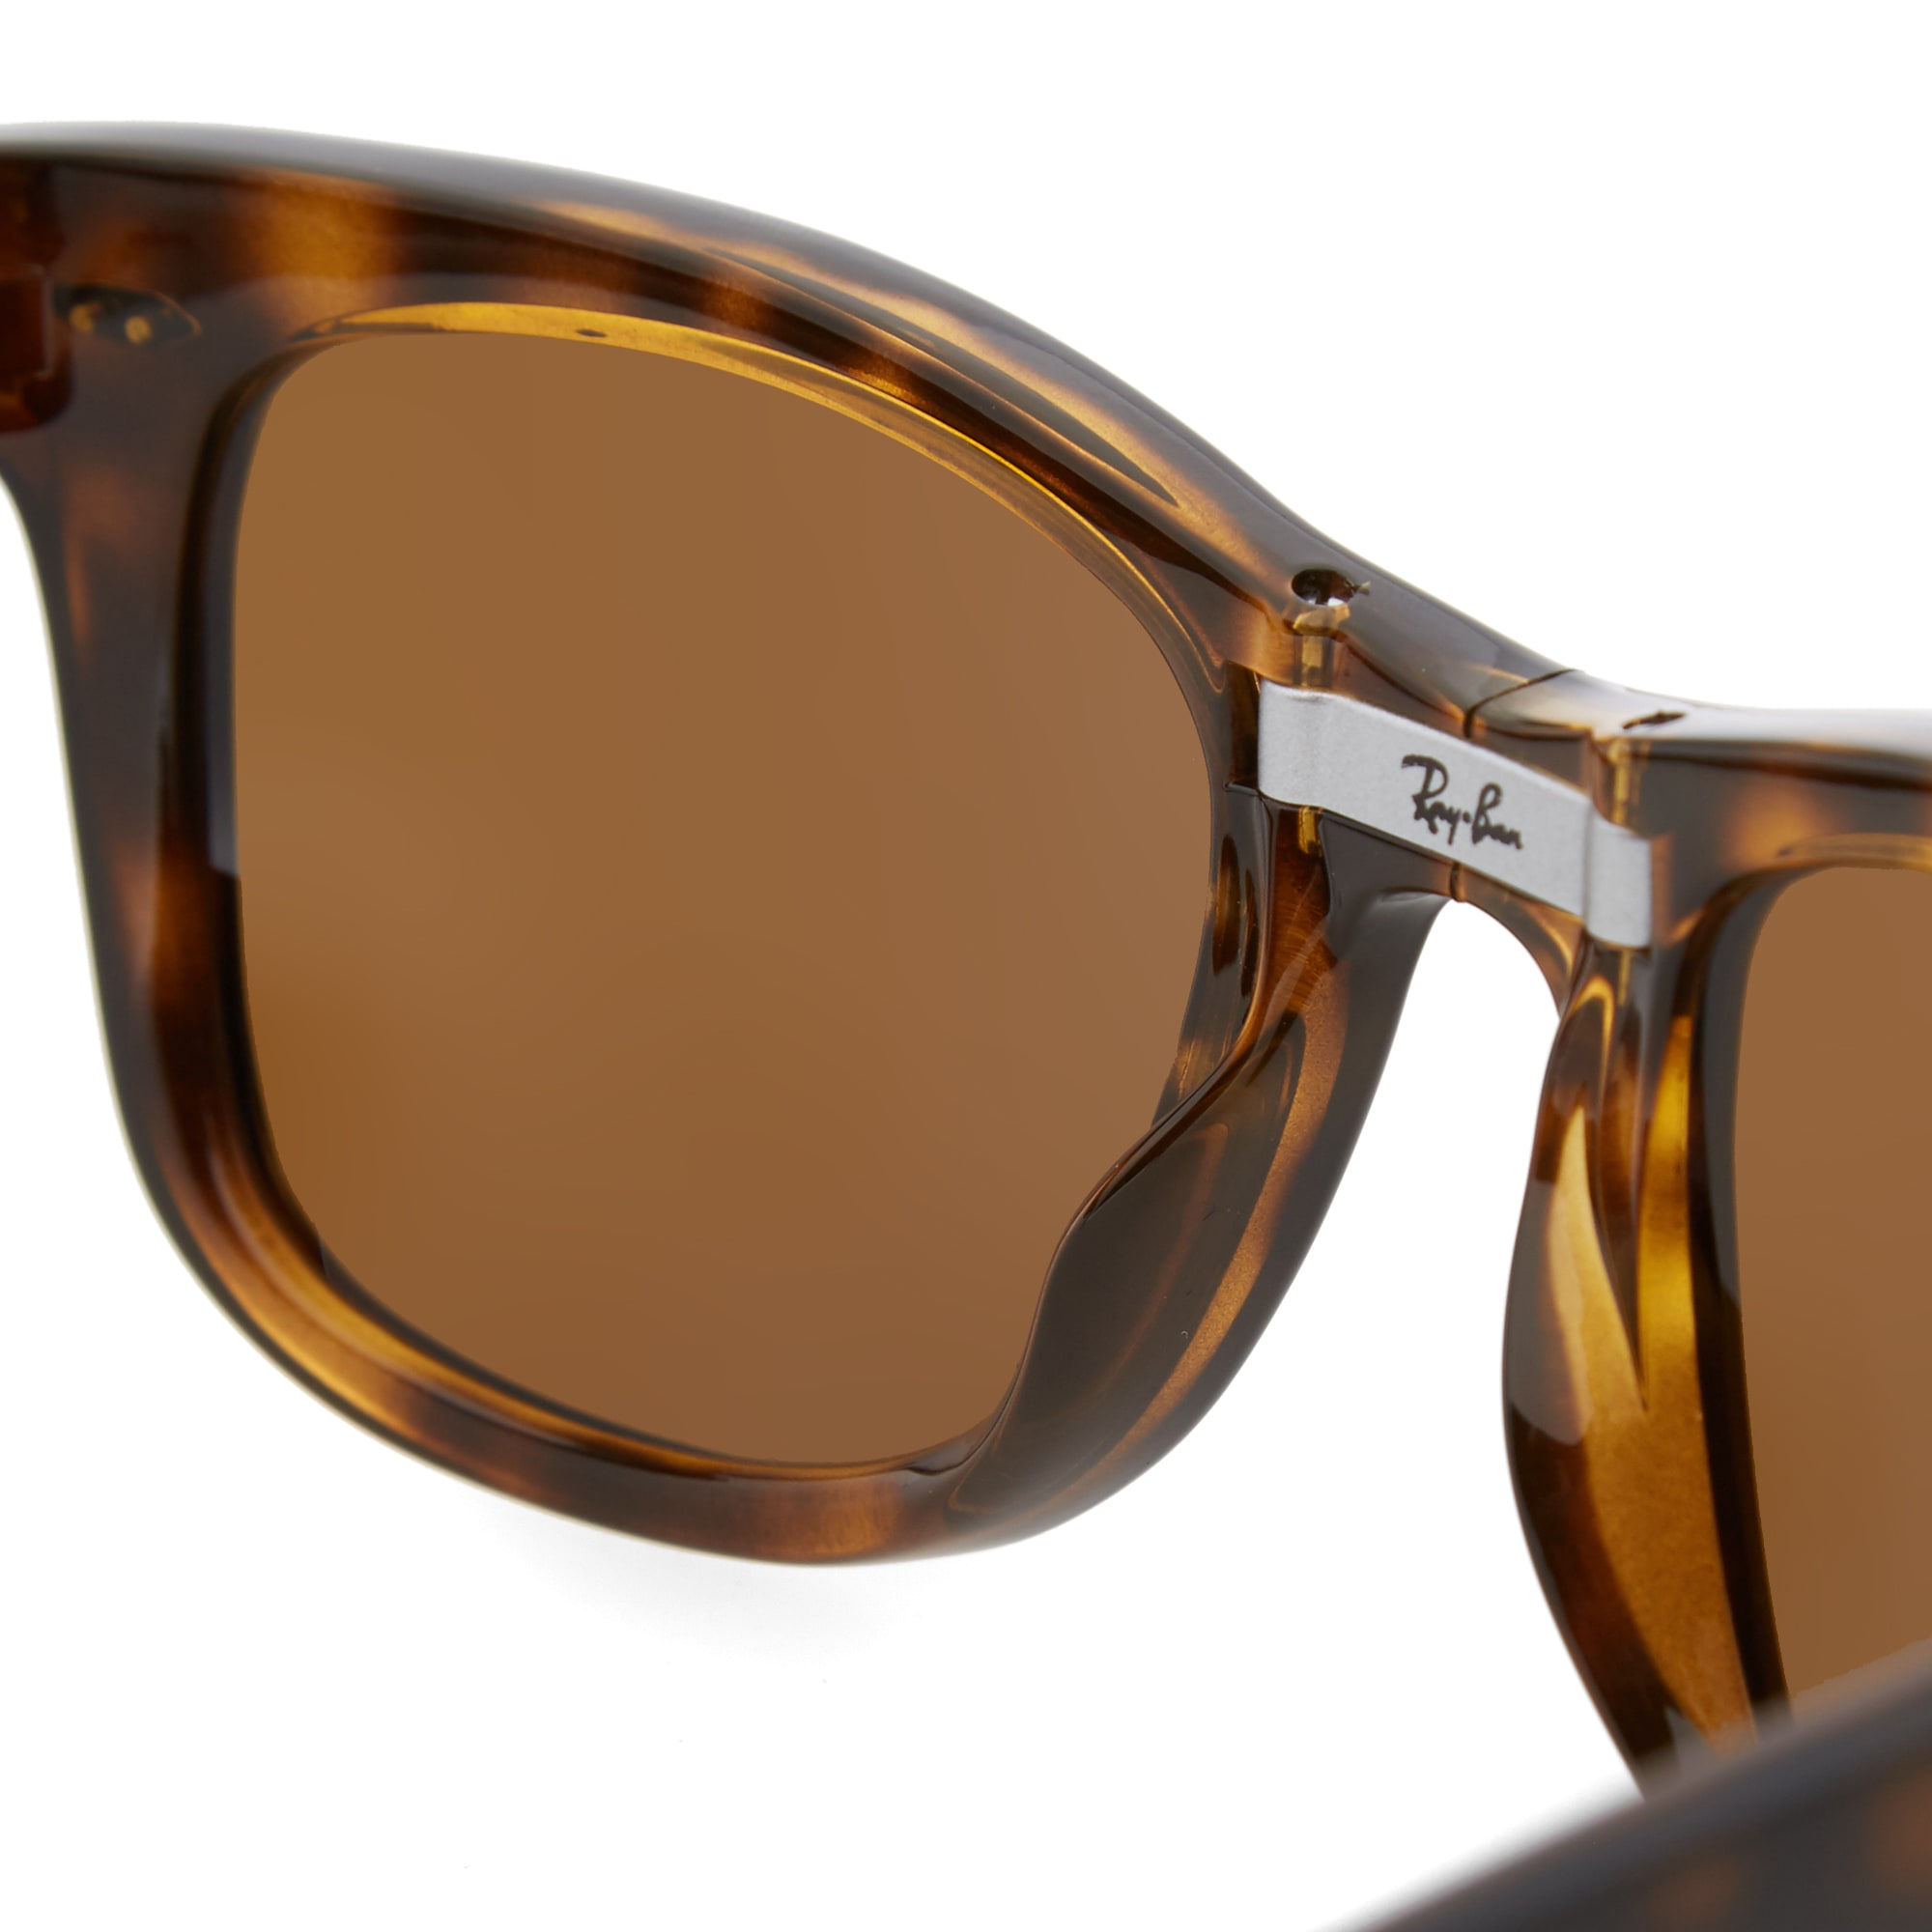 0a416c57435 Ray Ban Wayfarer Folding Sunglasses Light Havana   Brown